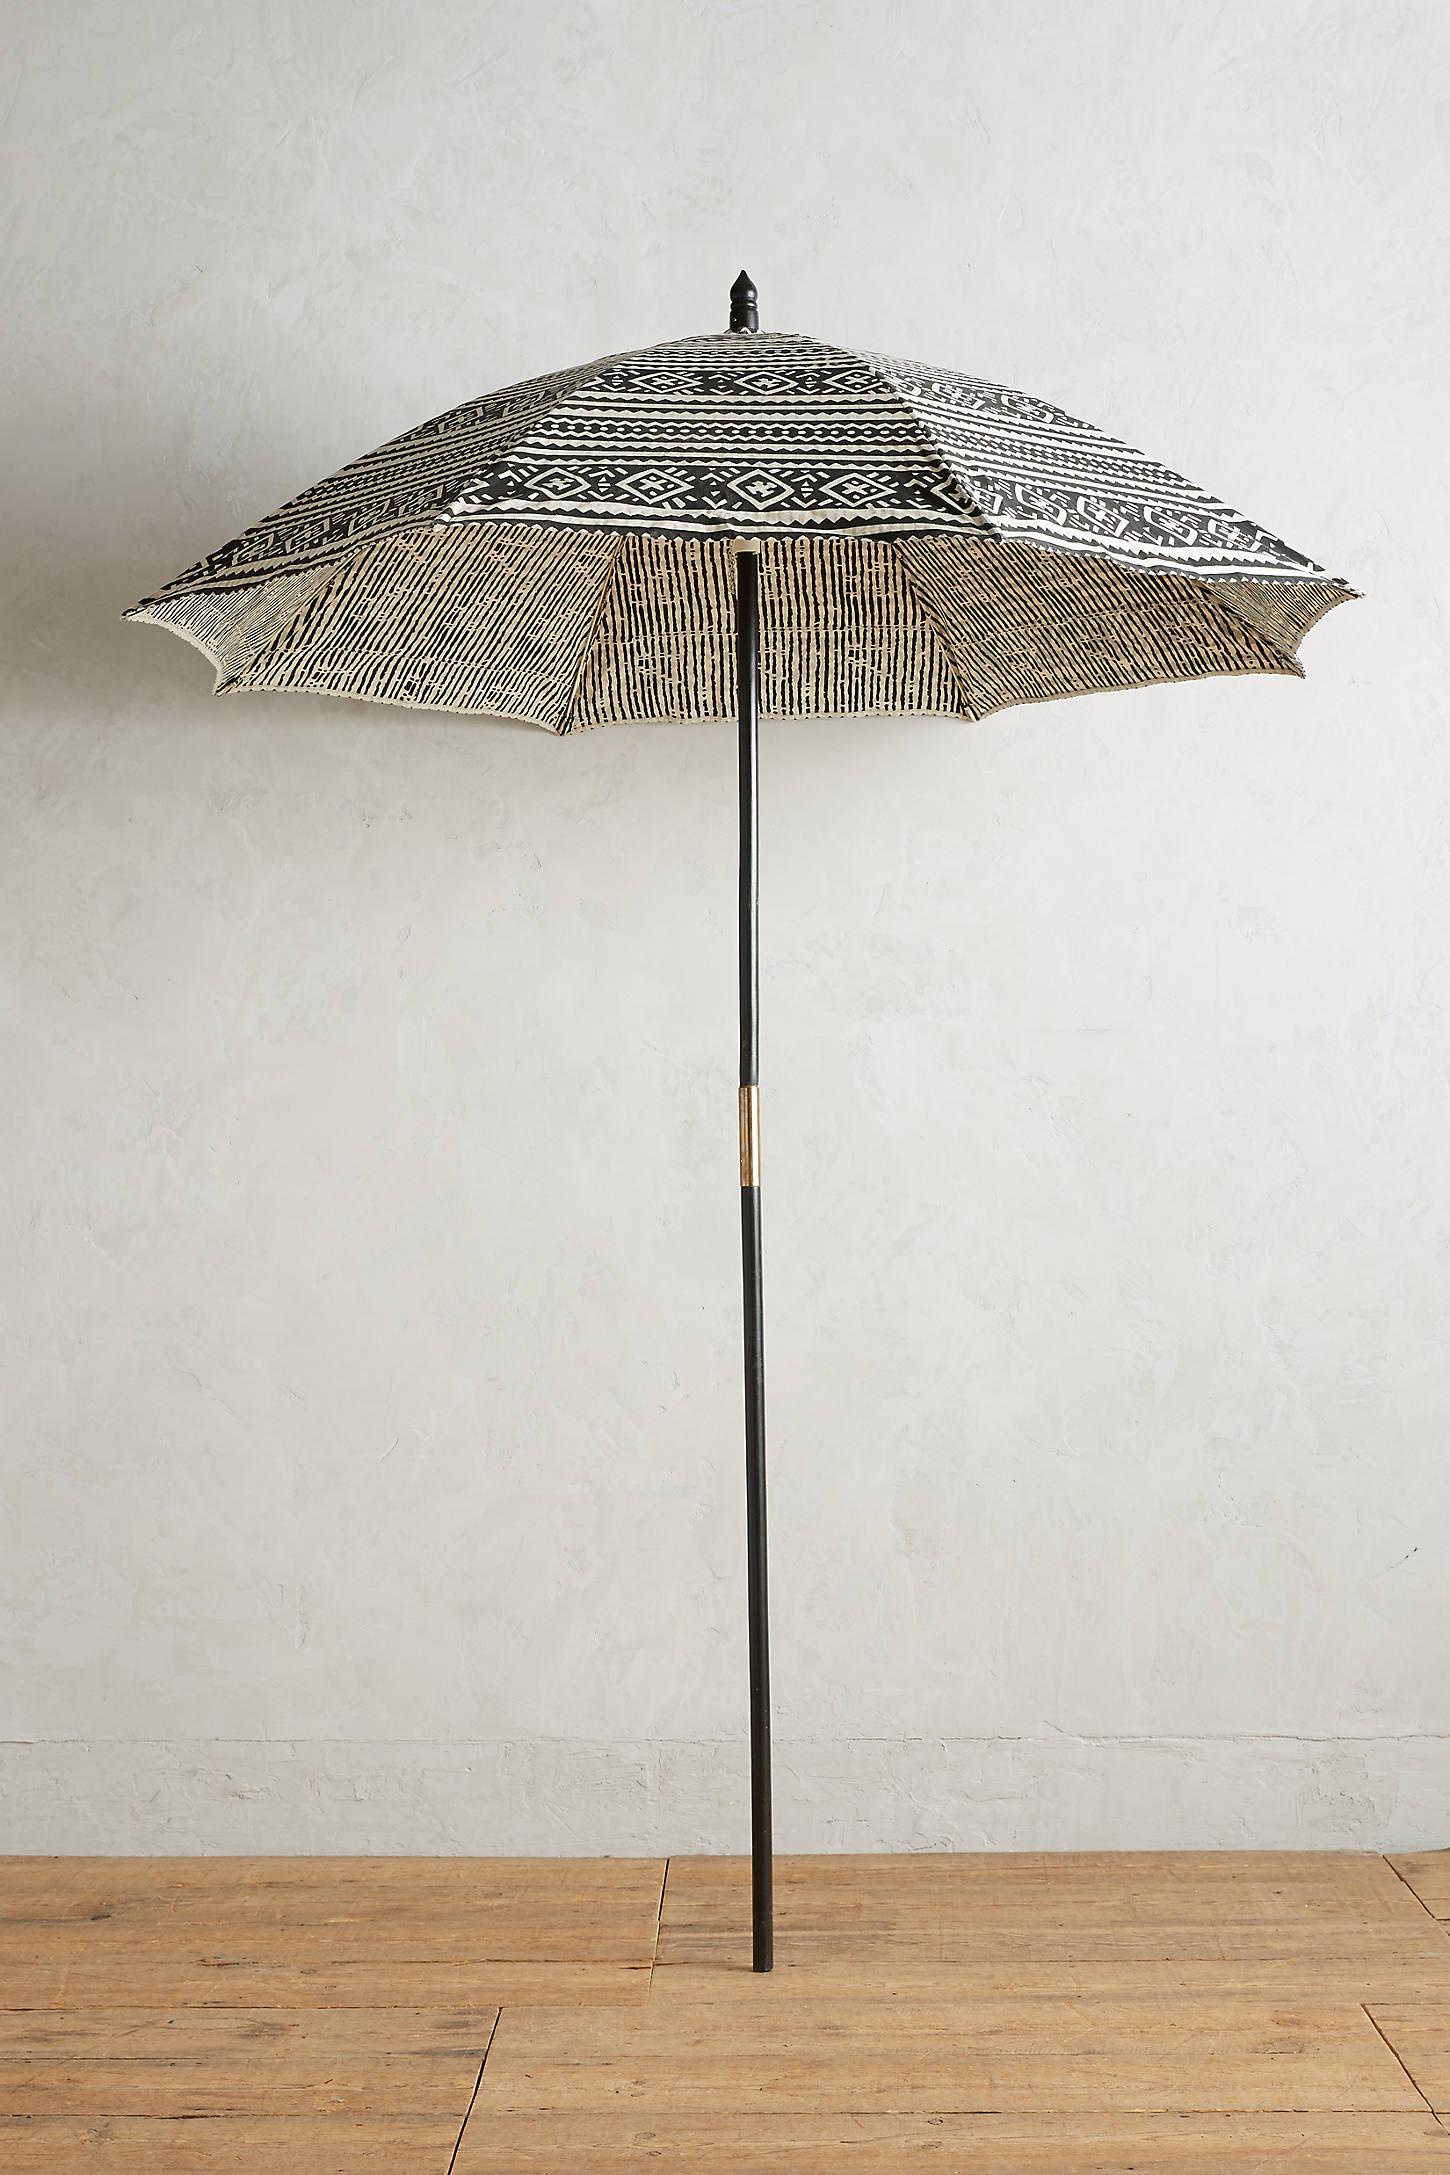 Yuakan Umbrella